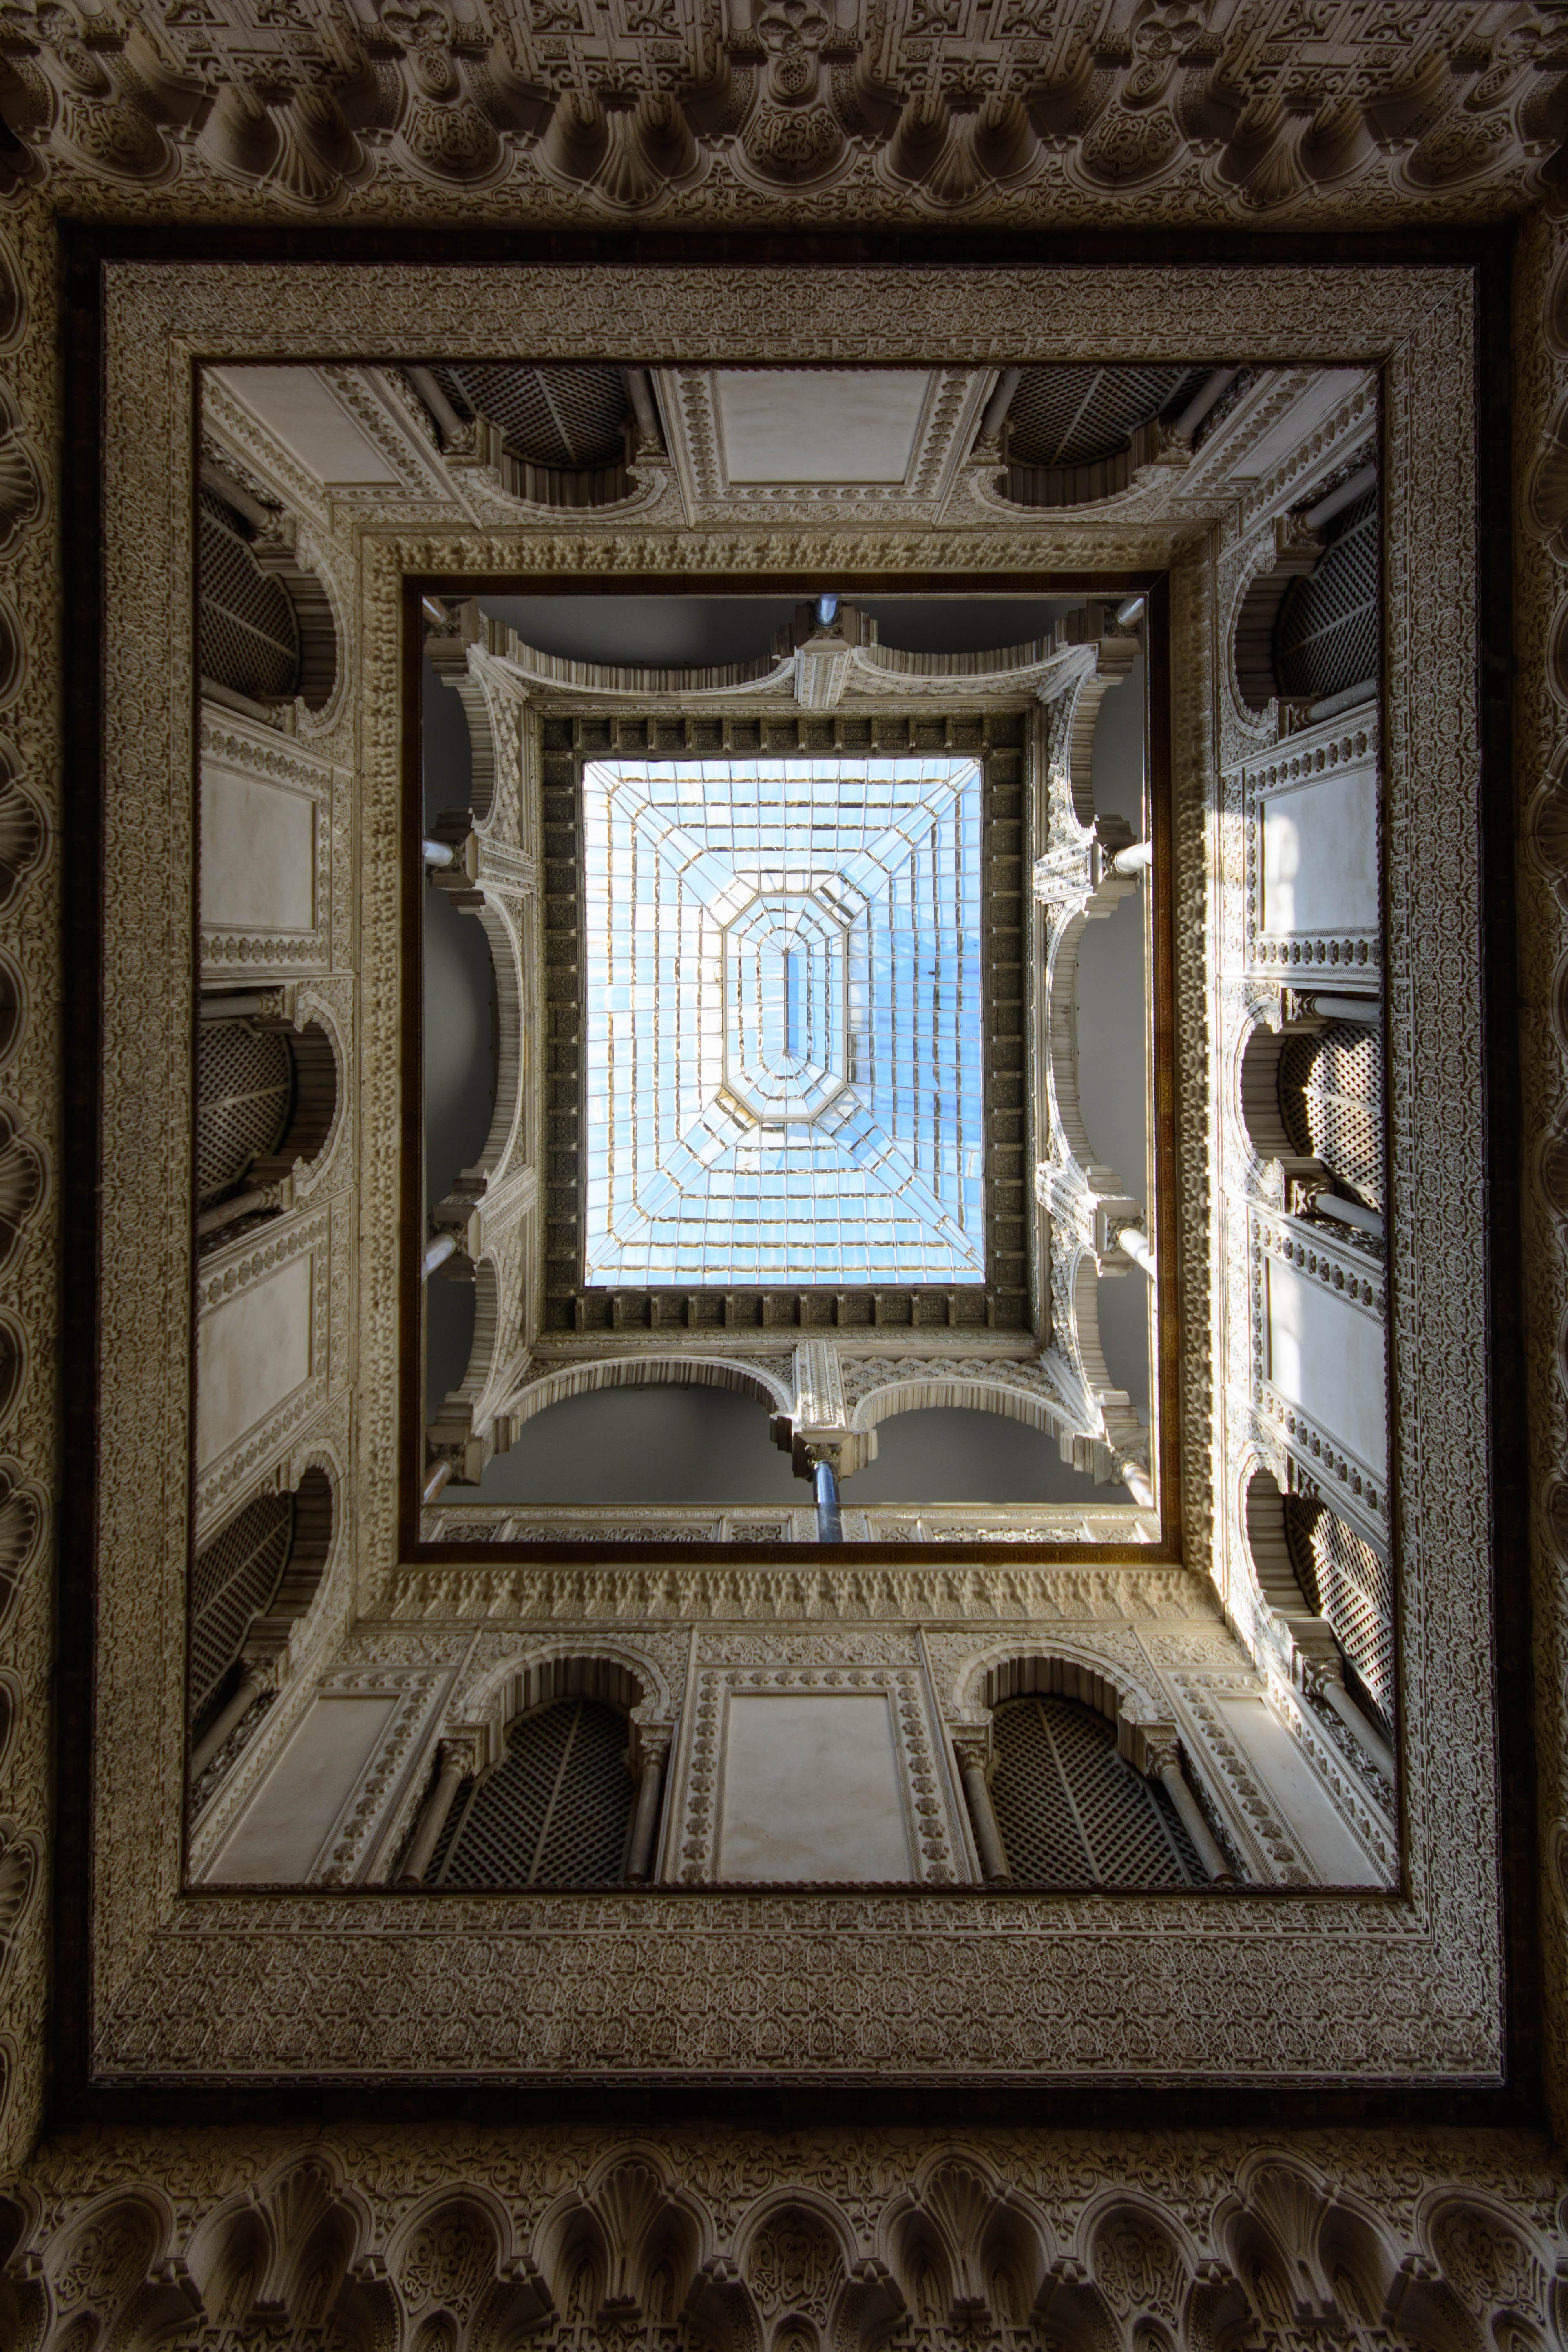 Fotos gratis : arquitectura, palacio, ventana, pared, arco, sala ...